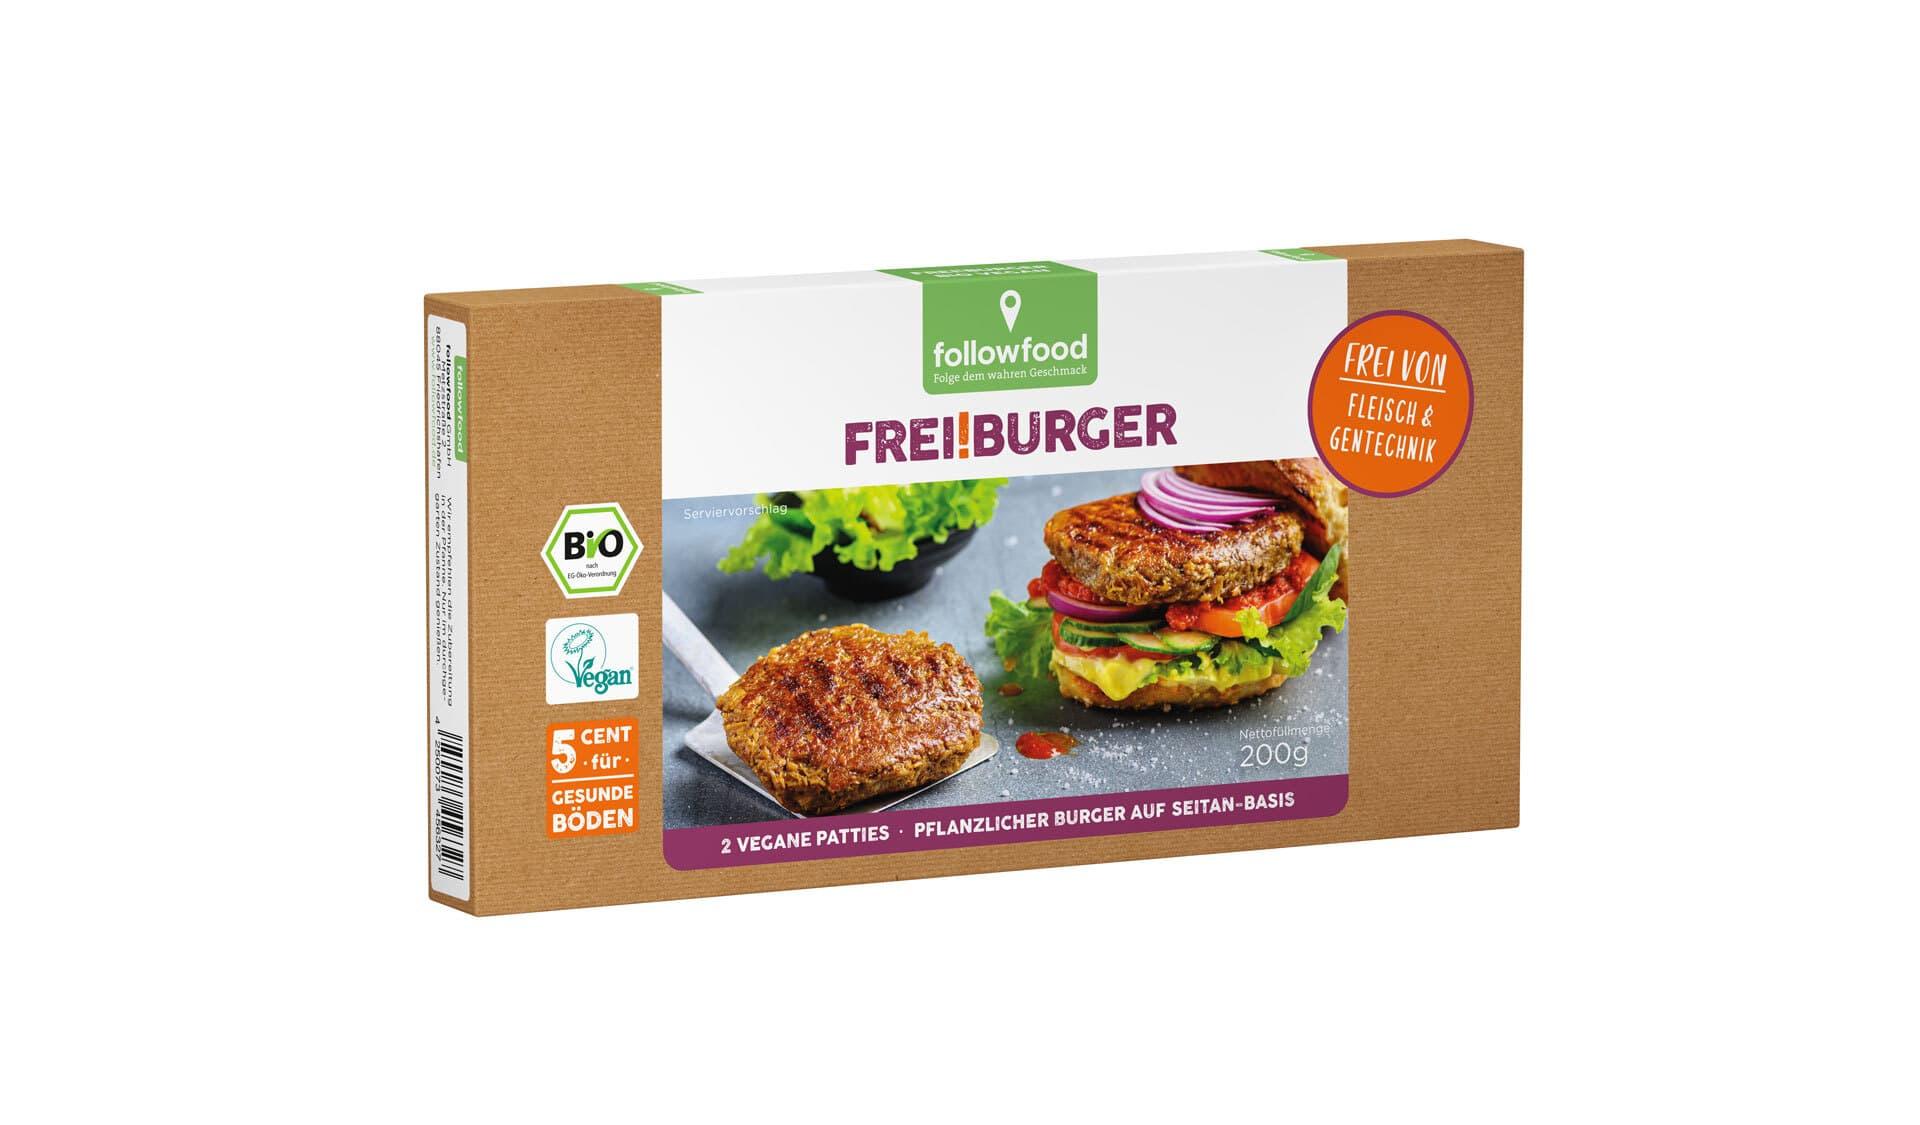 followfood Freiburger Bio vegan